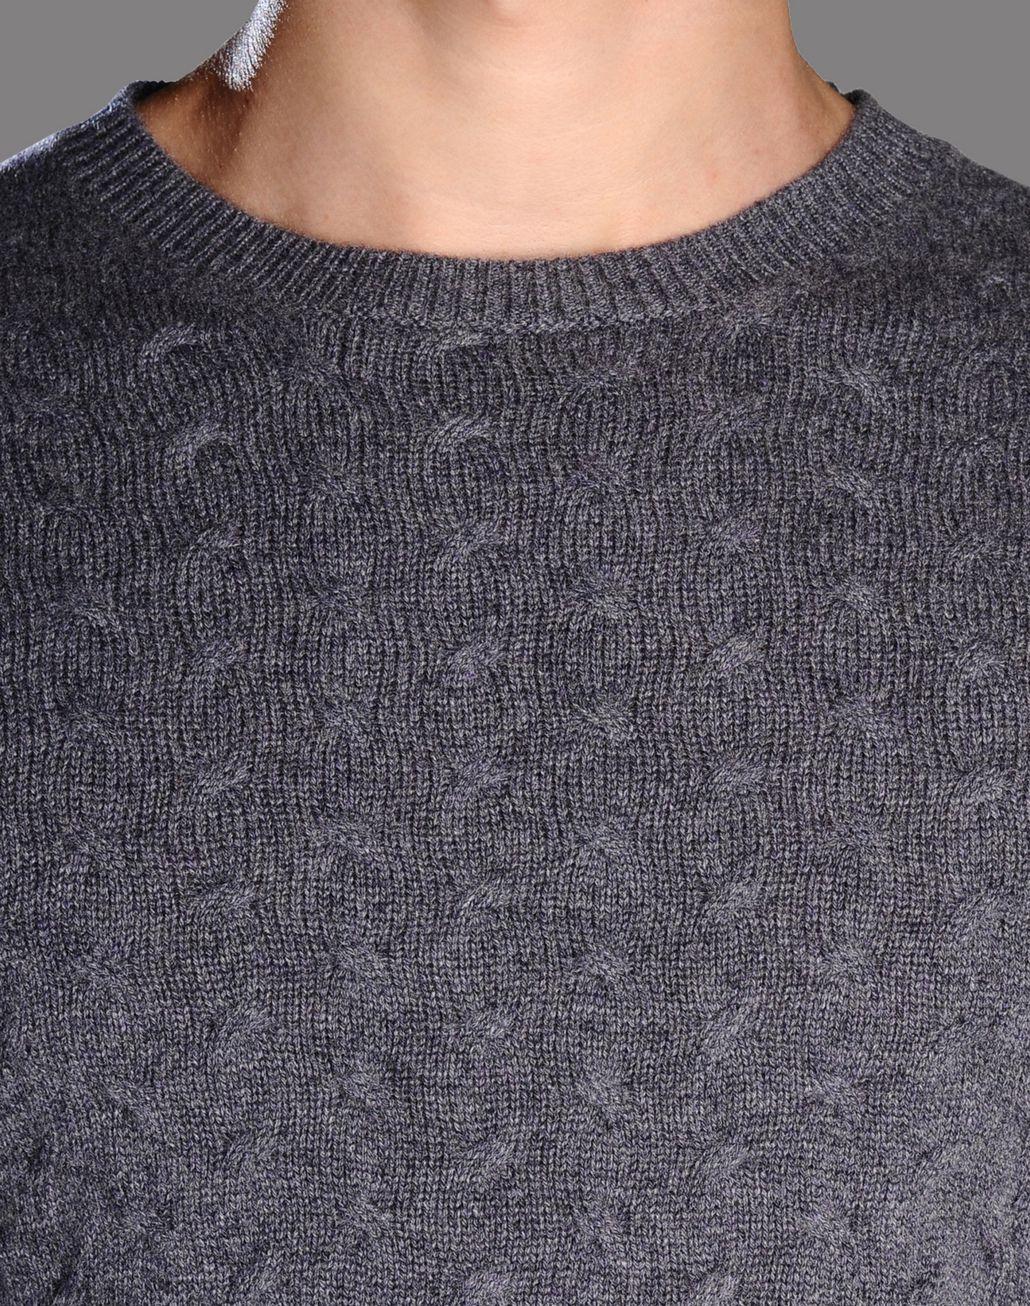 BRIONI cable knit cashmere jumper Knitwear U e